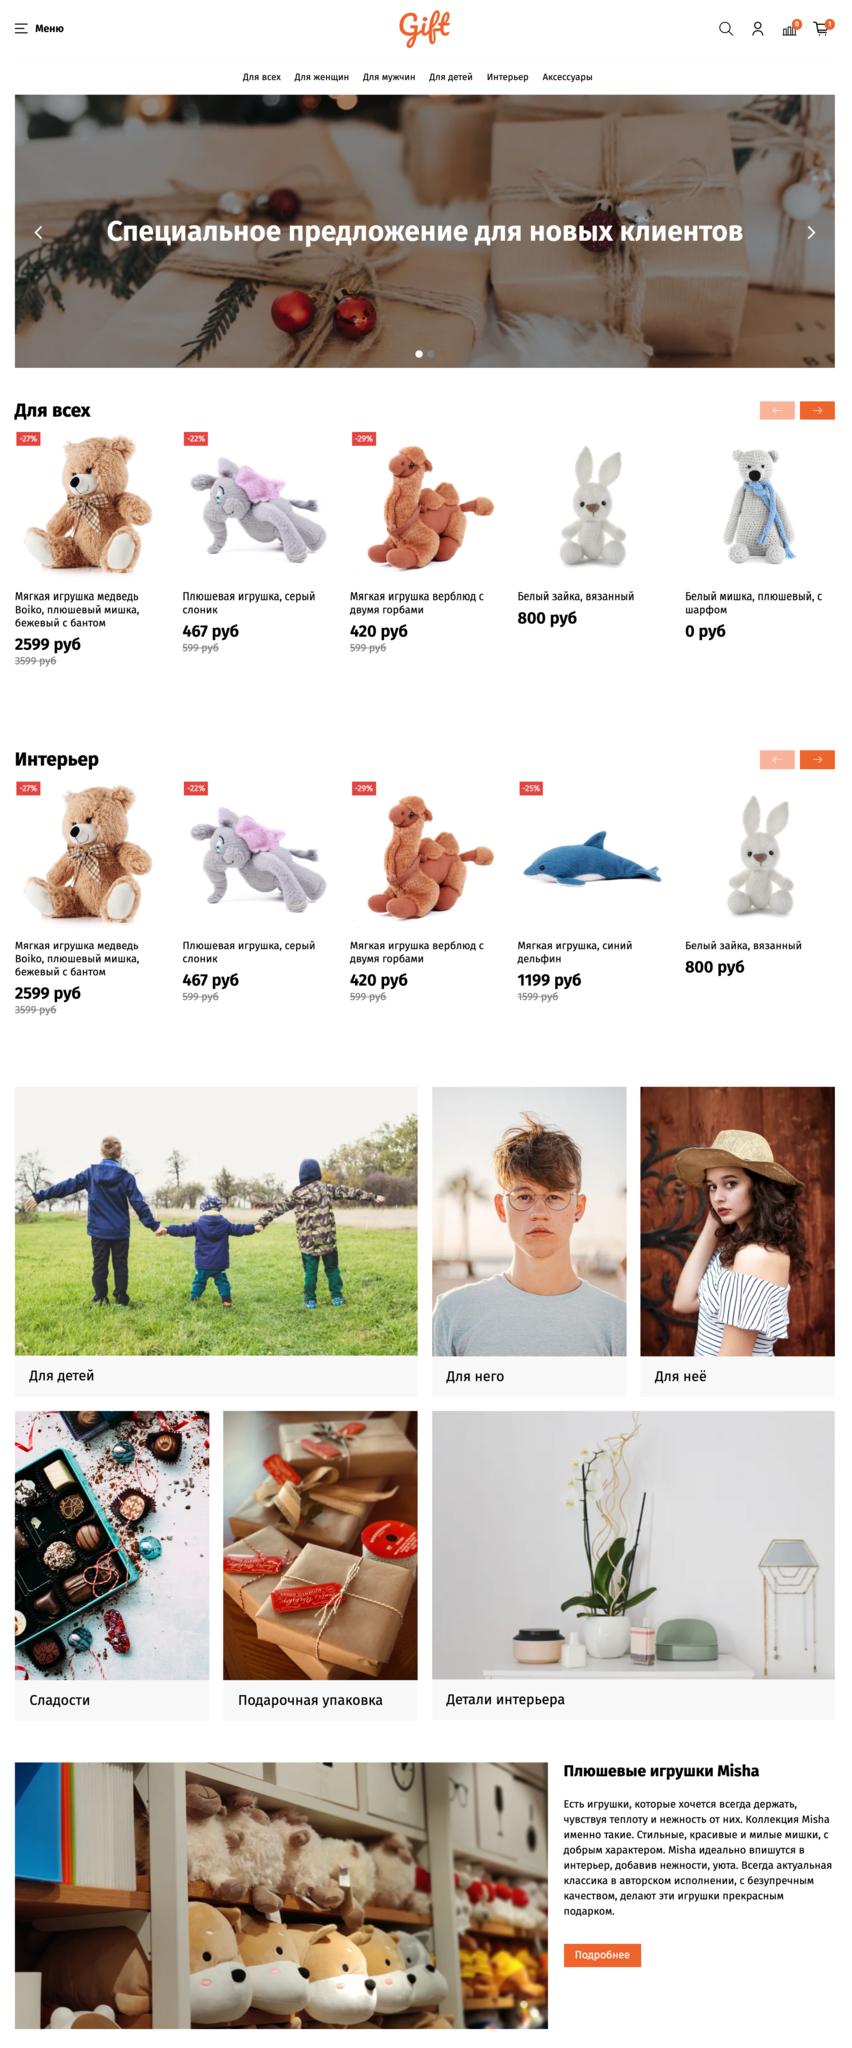 Шаблон интернет магазина - Gift